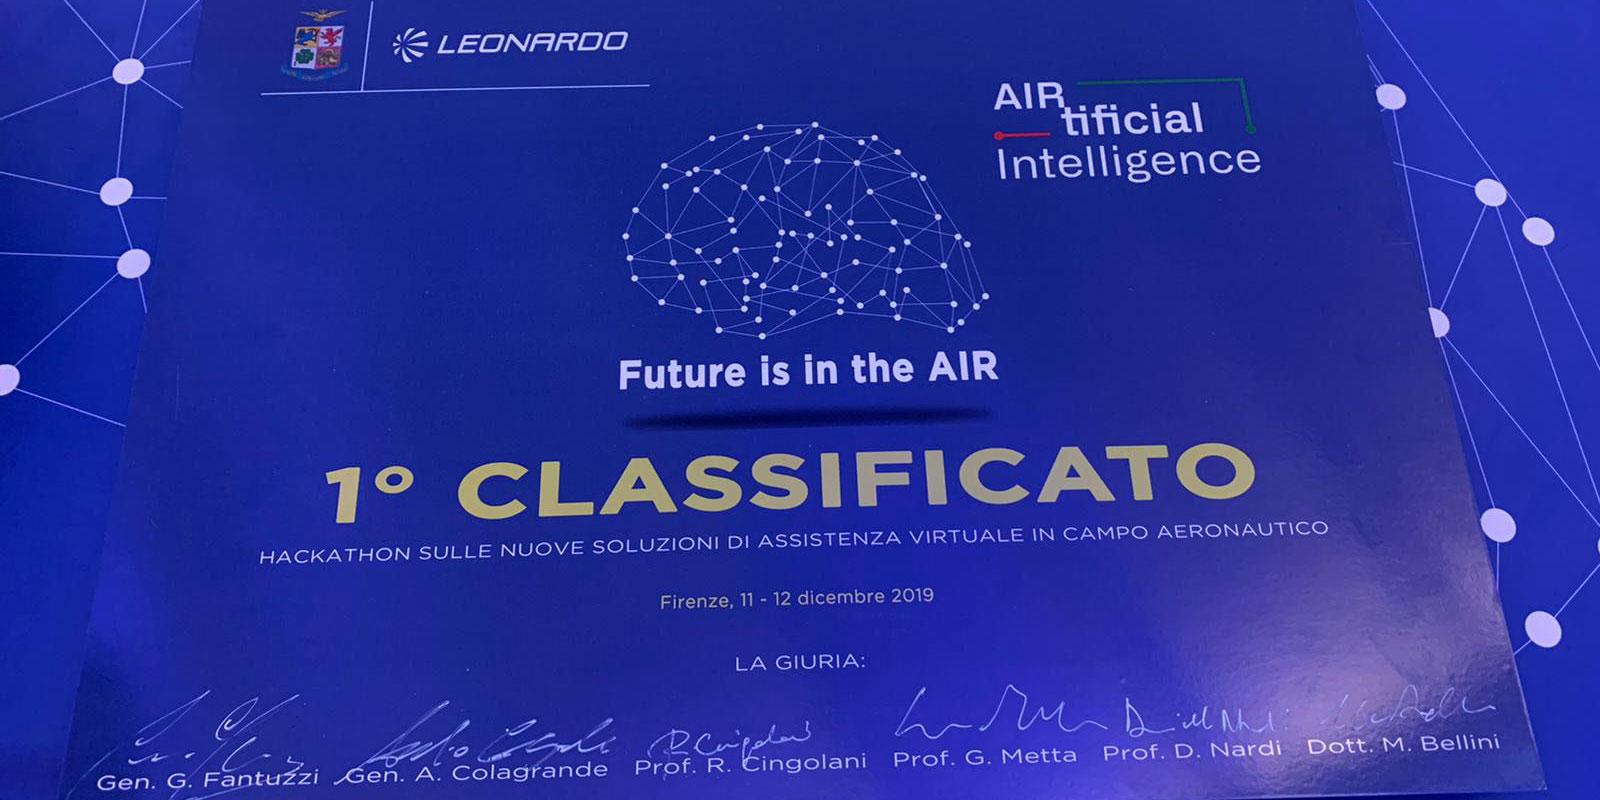 leonardo-iprod-airtificial-intelligence